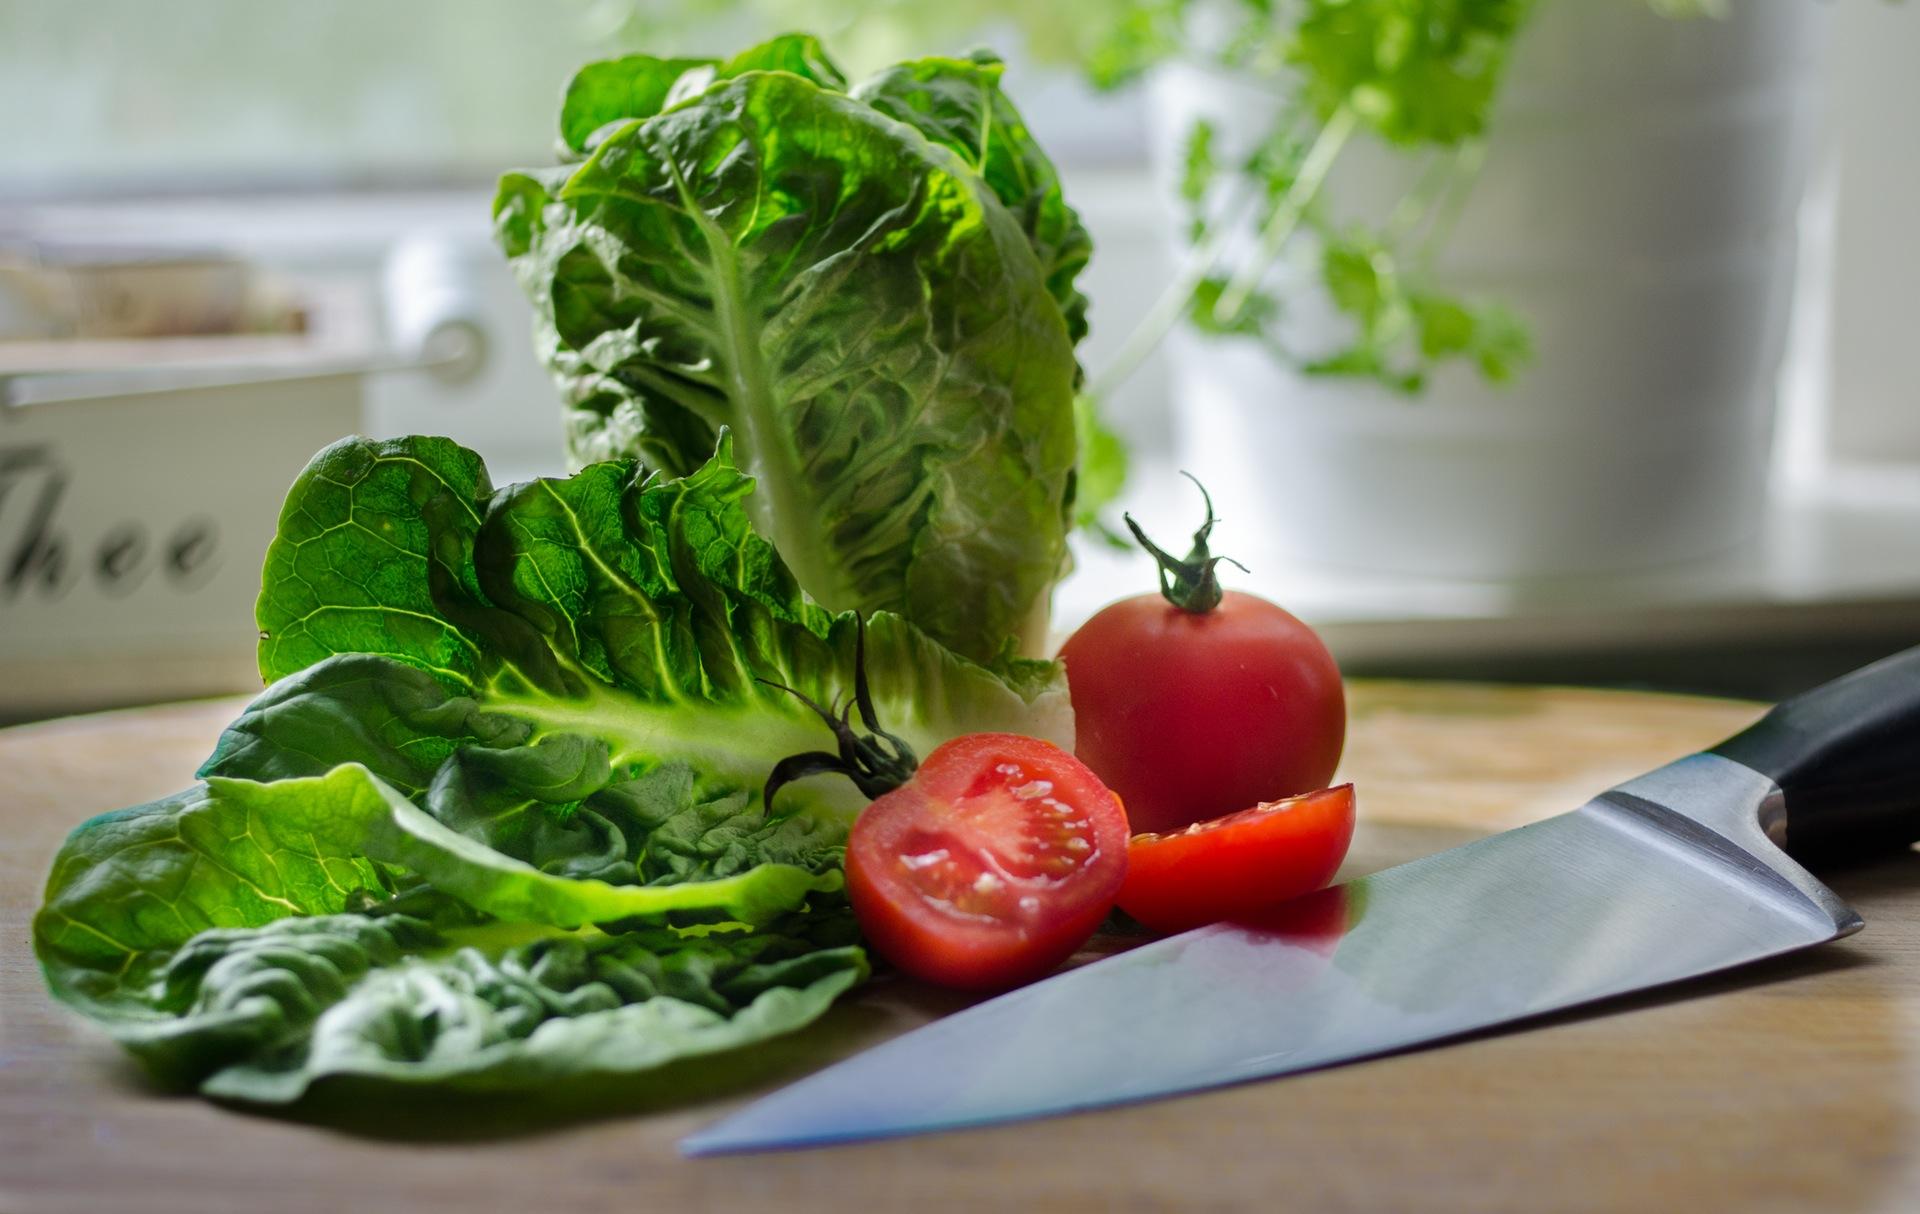 salad-restaurant-tomatoes-kitchen